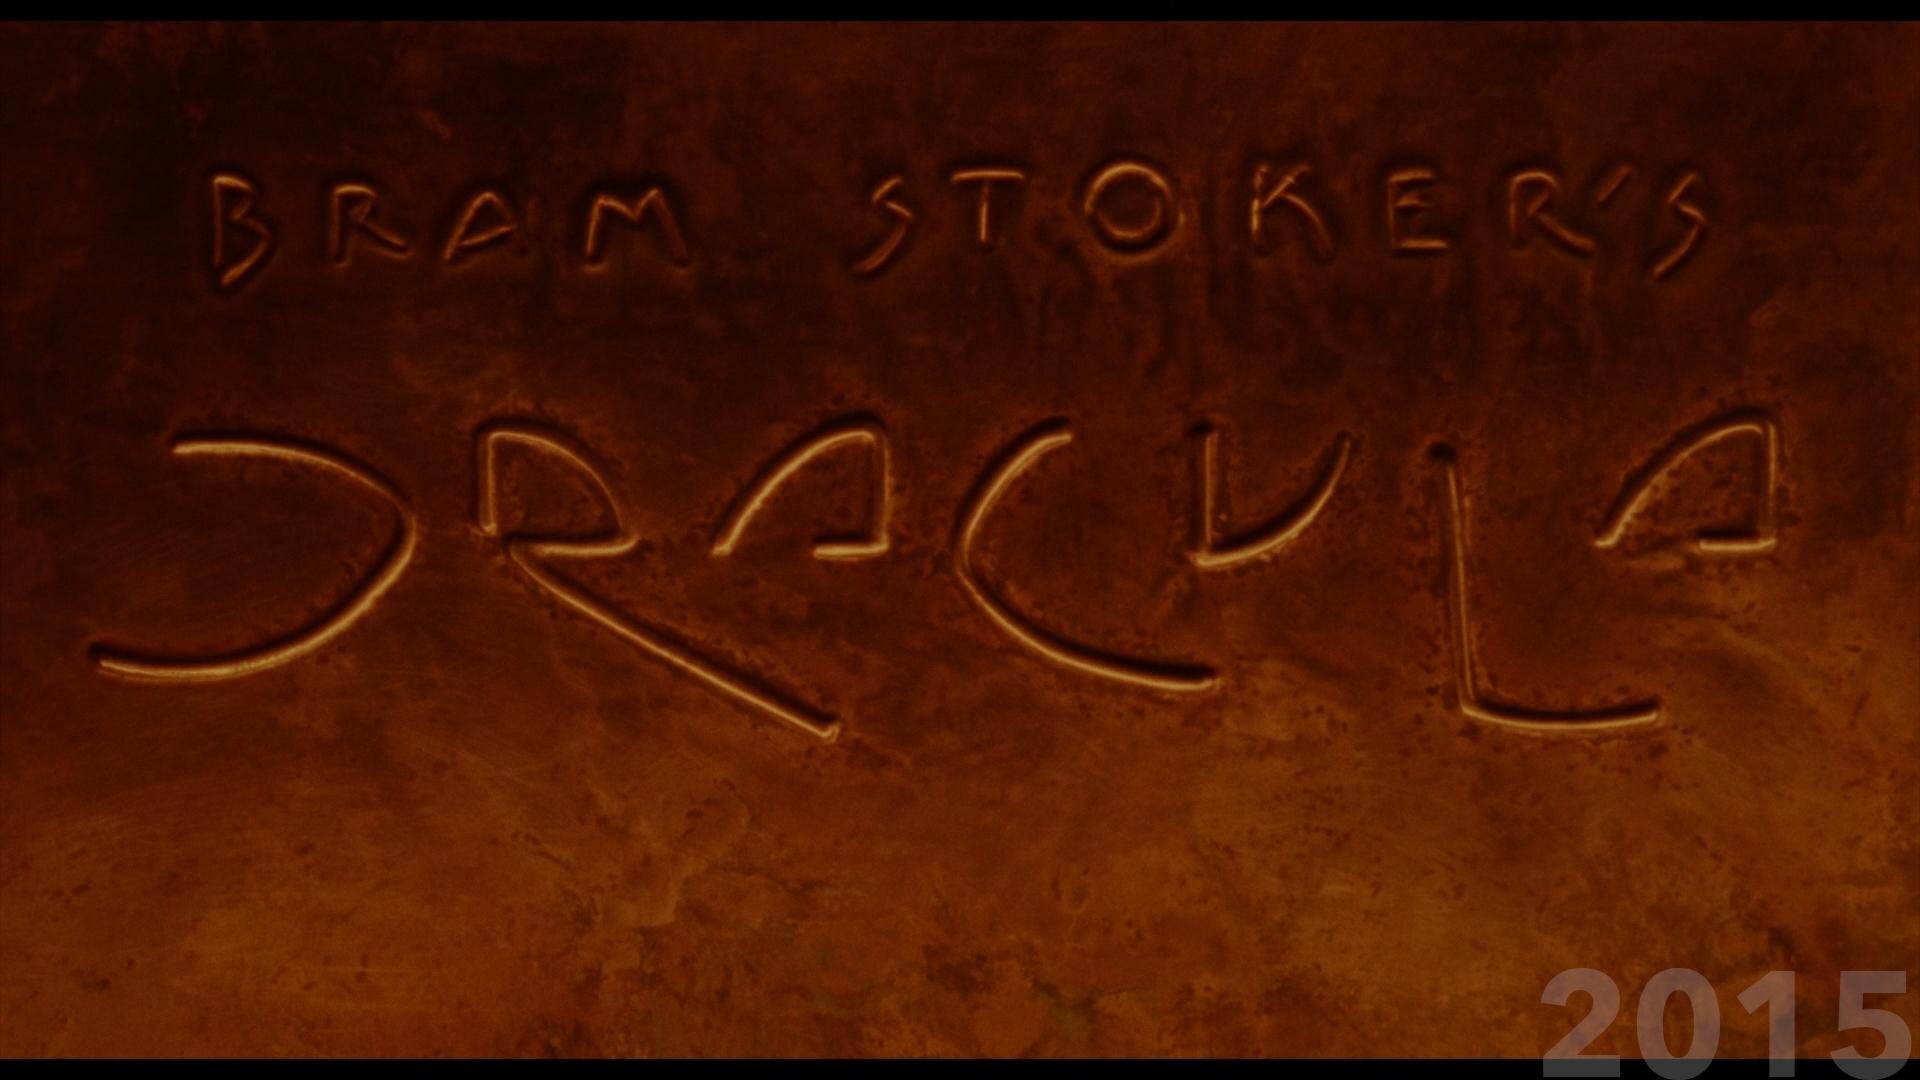 Bram Stoker's Dracula movie title 2015